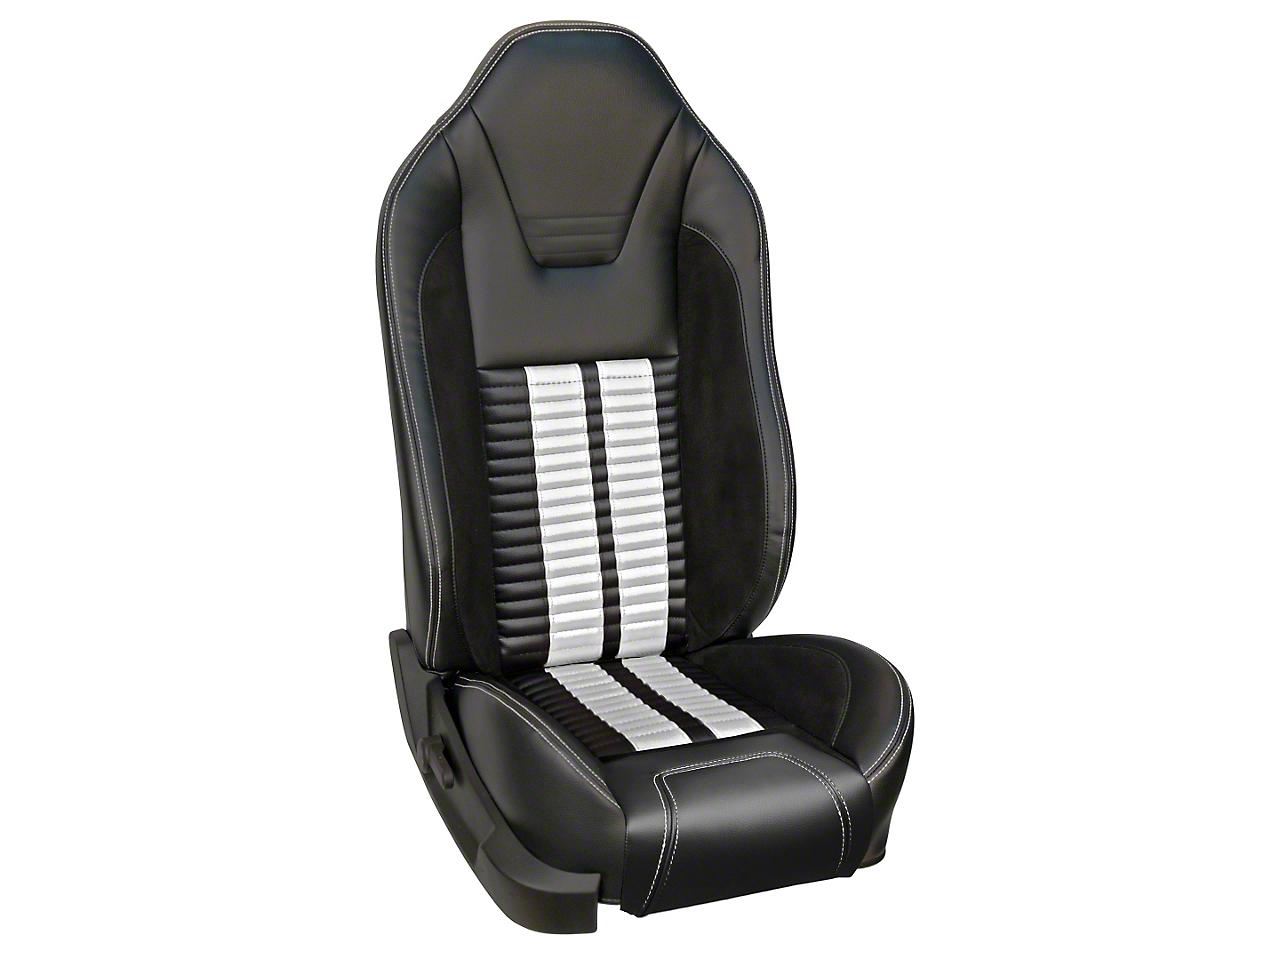 TMI Premium Sport R500 Upholstery & Foam Kit with Airbags - Black Vinyl & White Stripe/Stitch (05-10 GT, V6)